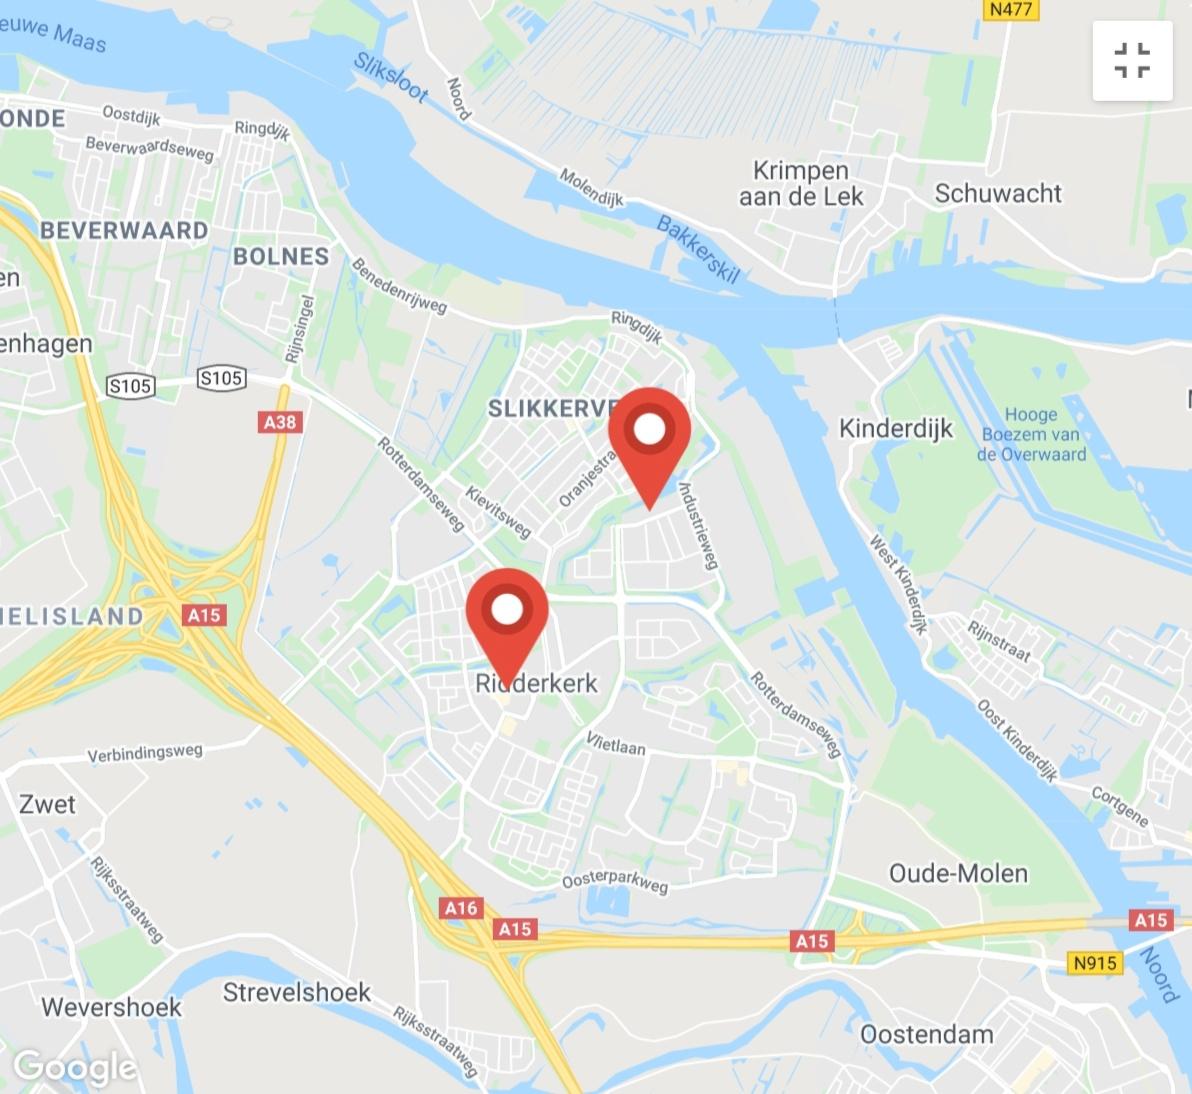 Coronavirus test locaties Ridderkerk - coronatest-ridderkerk.com